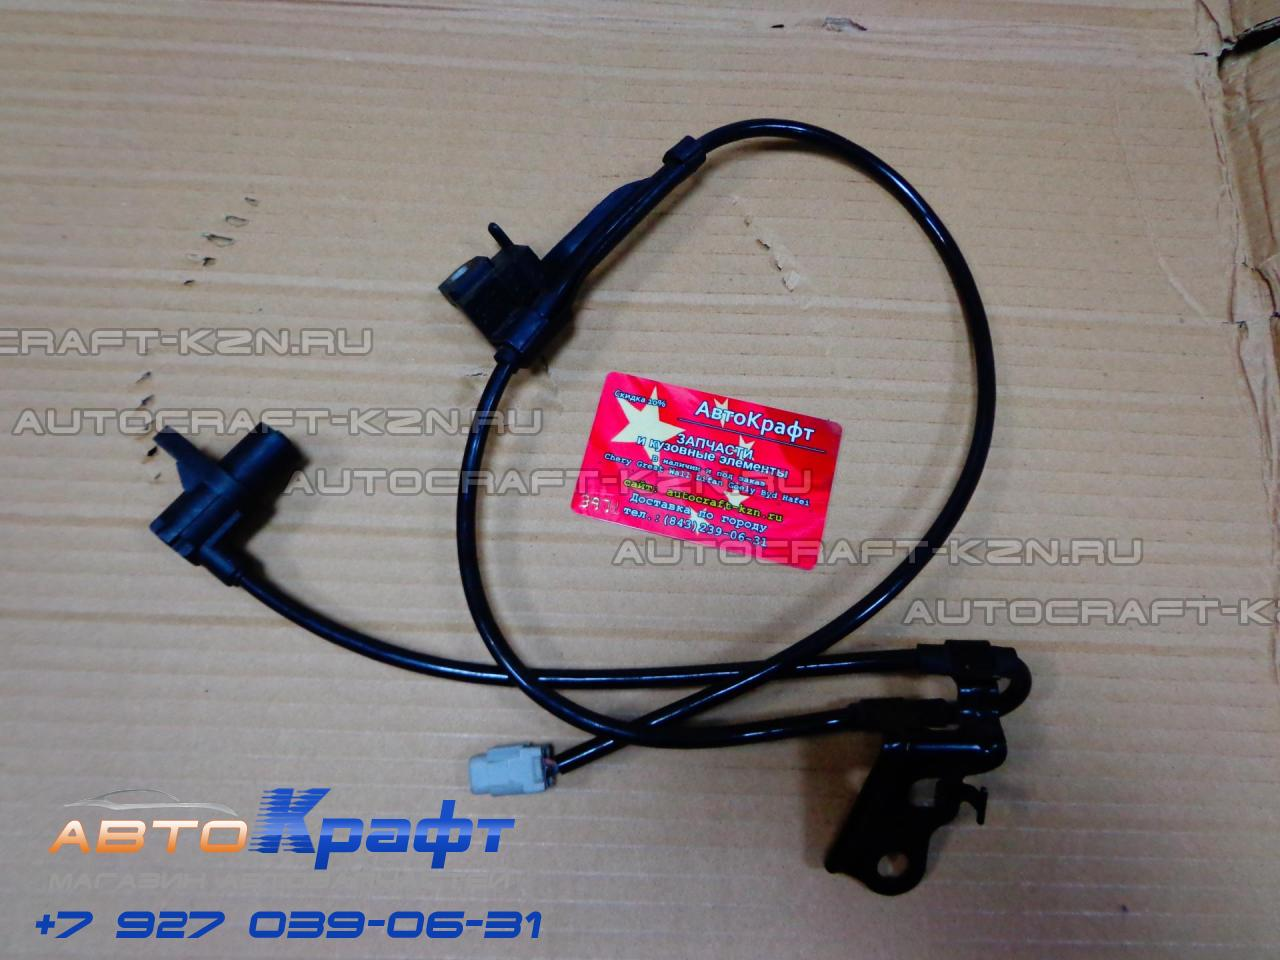 Схема распайки модемного кабеля фото 905